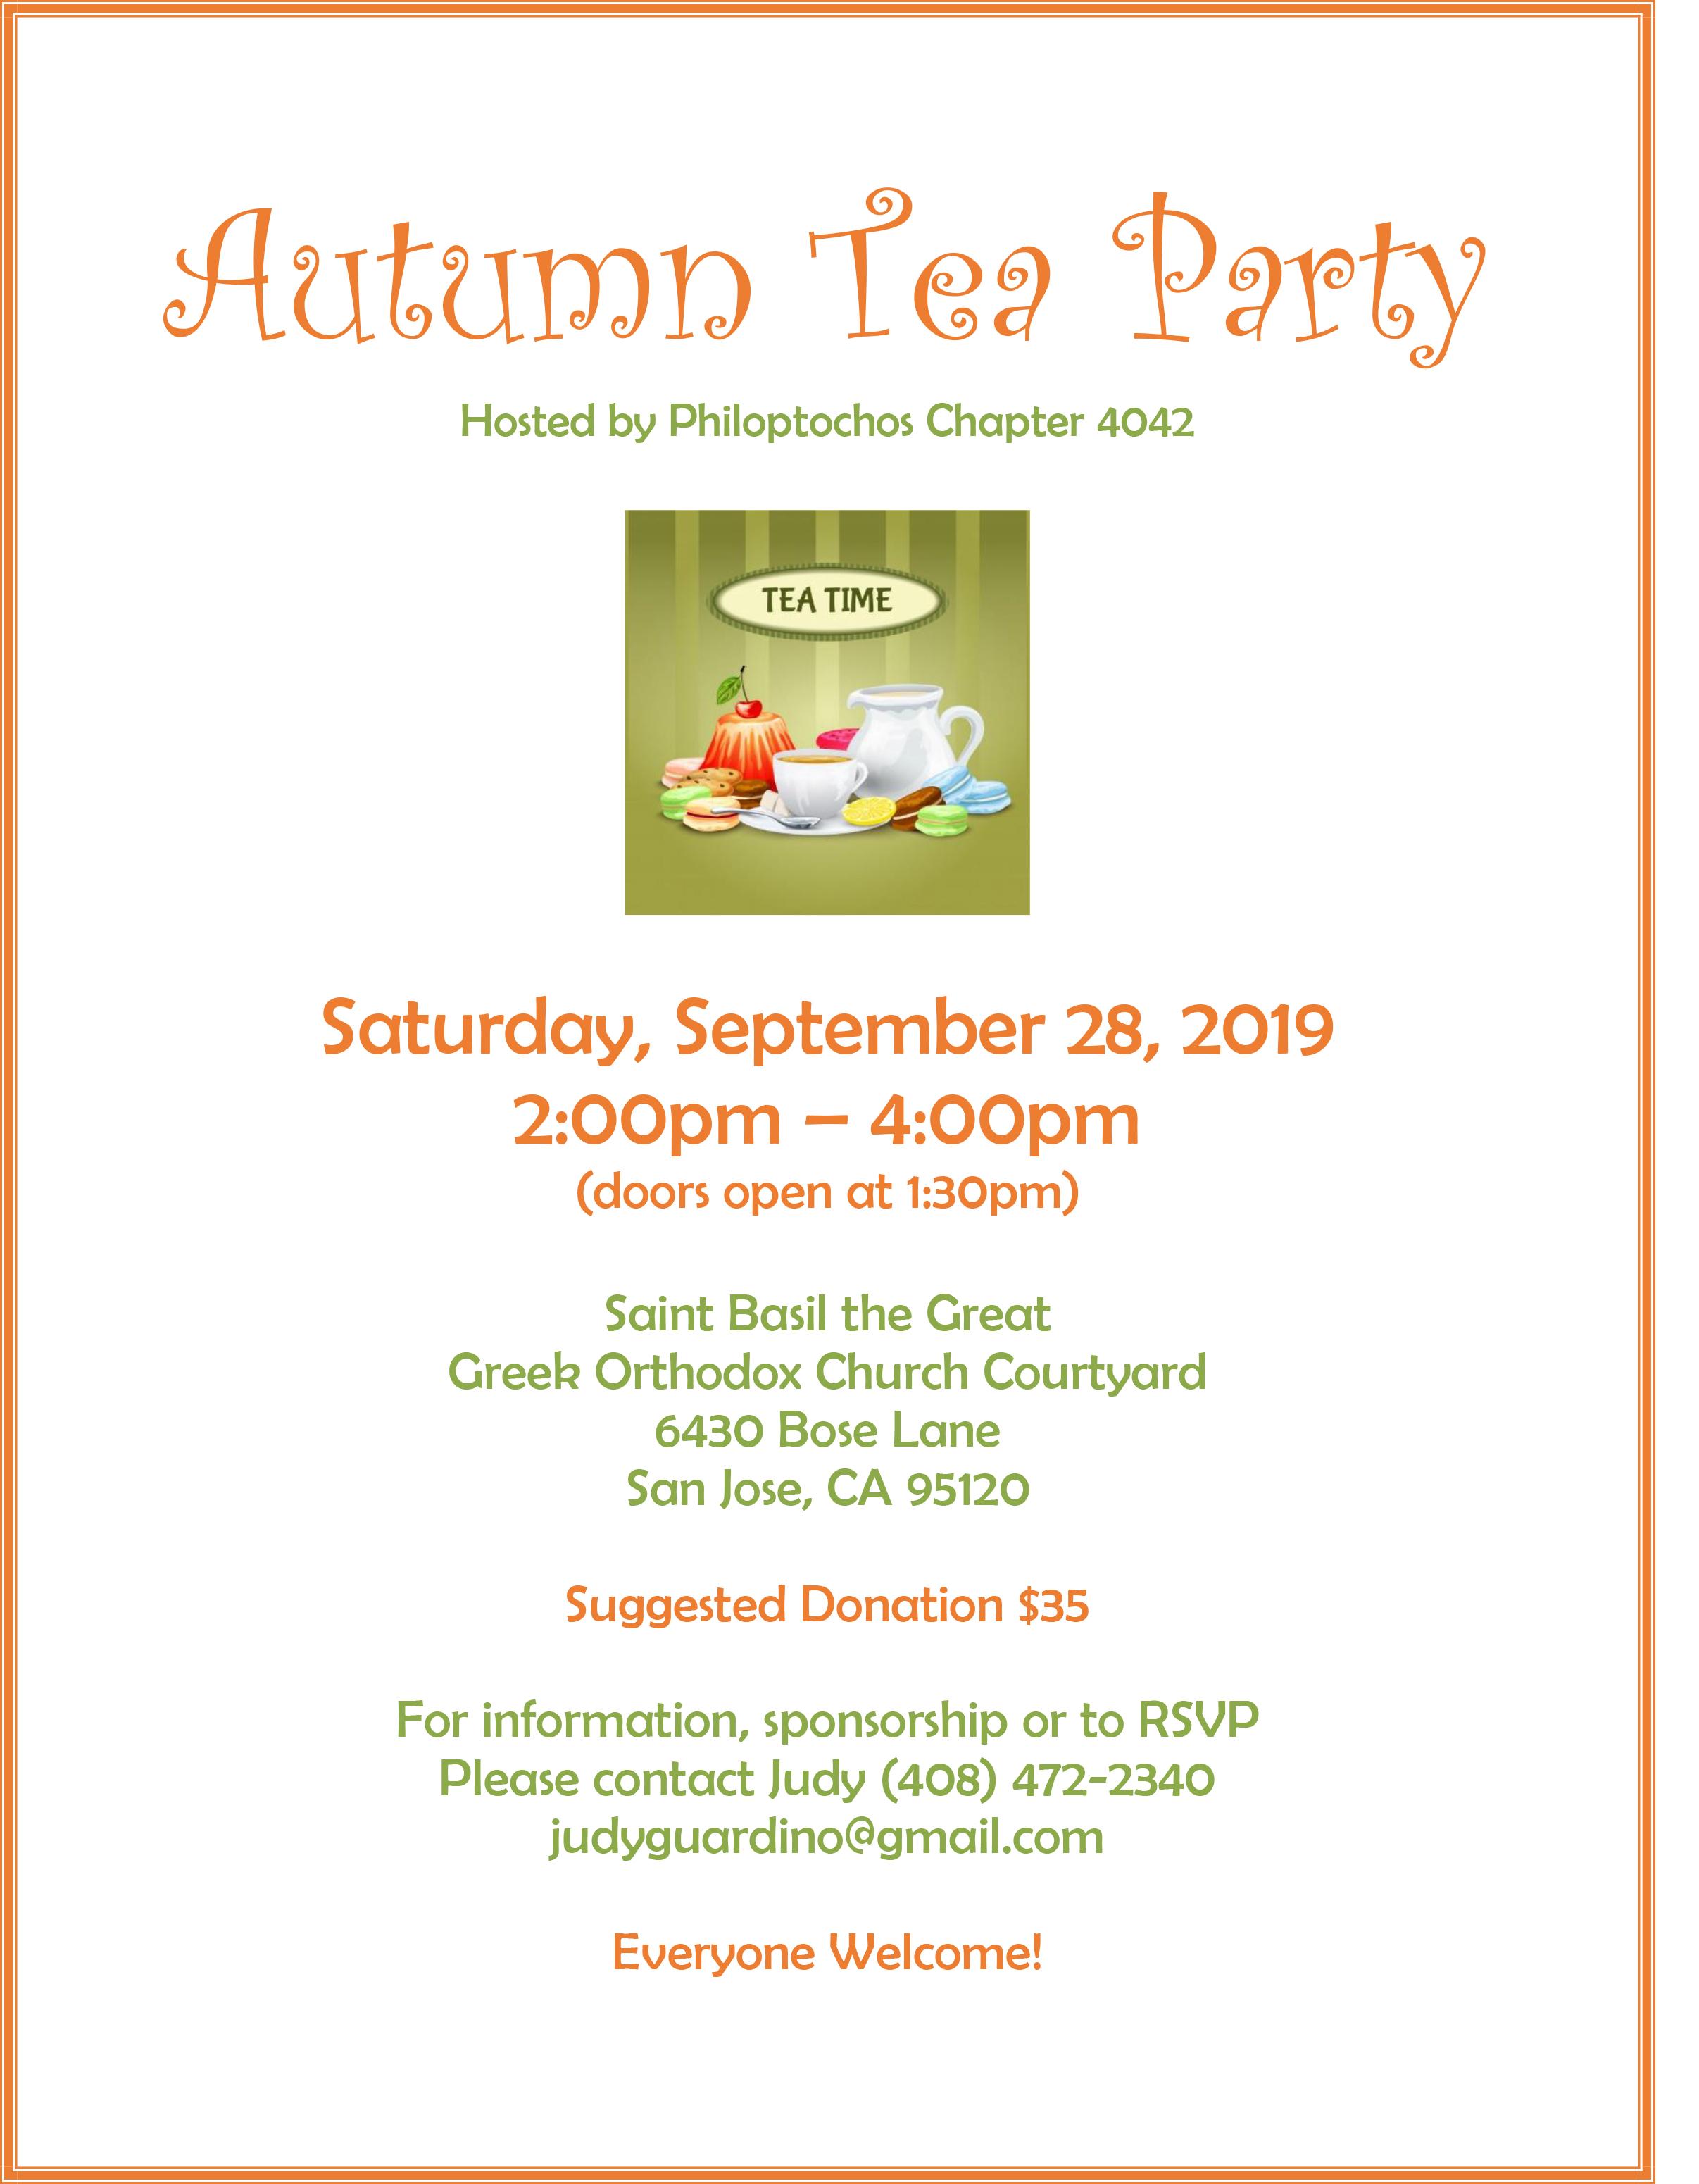 Tea Invitation Flyer.docx.jpg